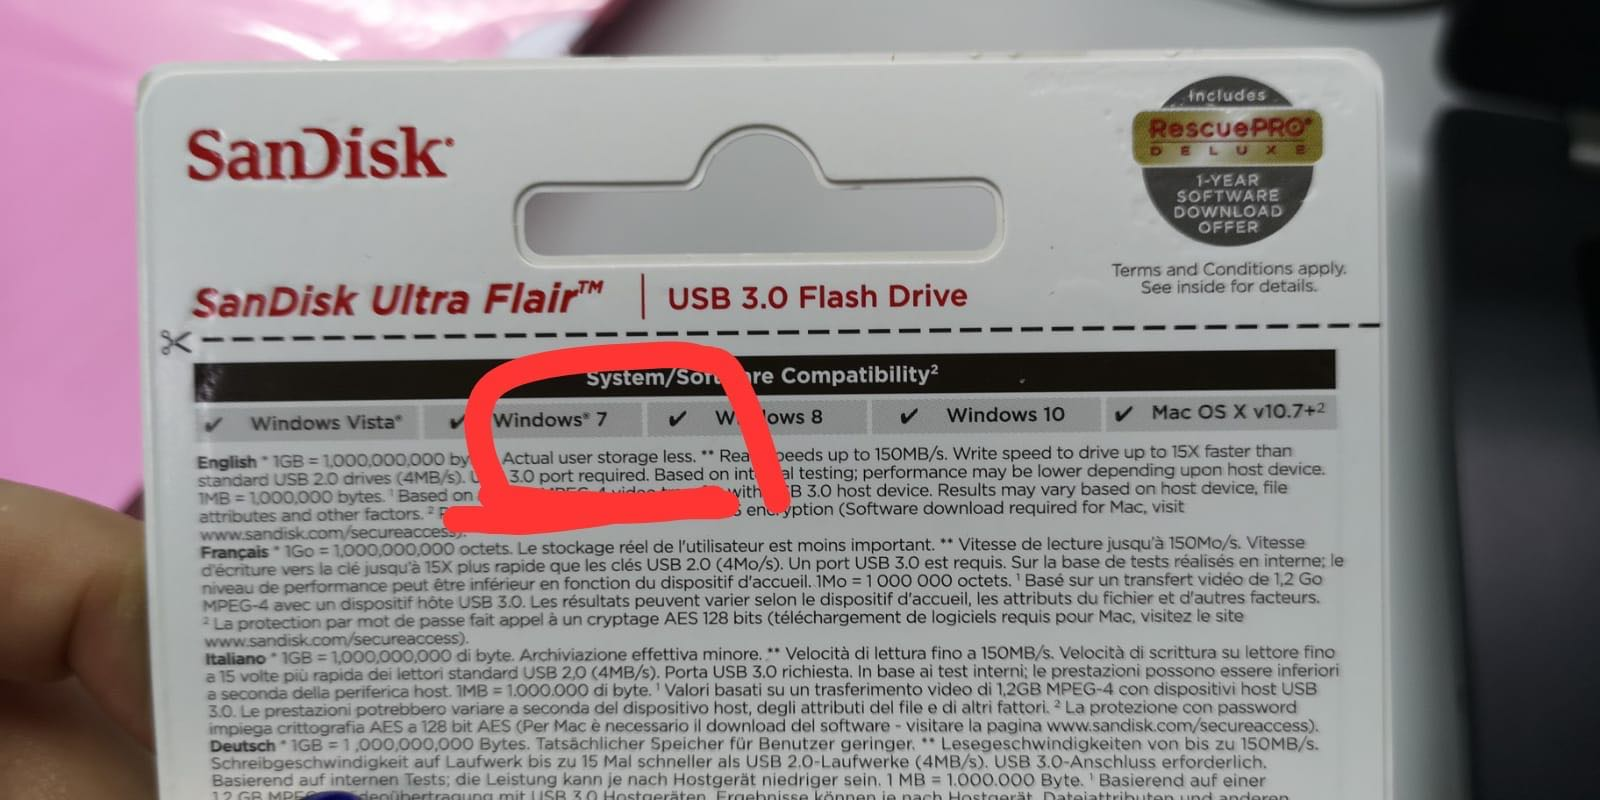 Sandisk Ultra Flair 64gb Usb 30 Flash Drive Up To 150mb S Sdcz73 Original 32gb Cz73 Lazada Singapore